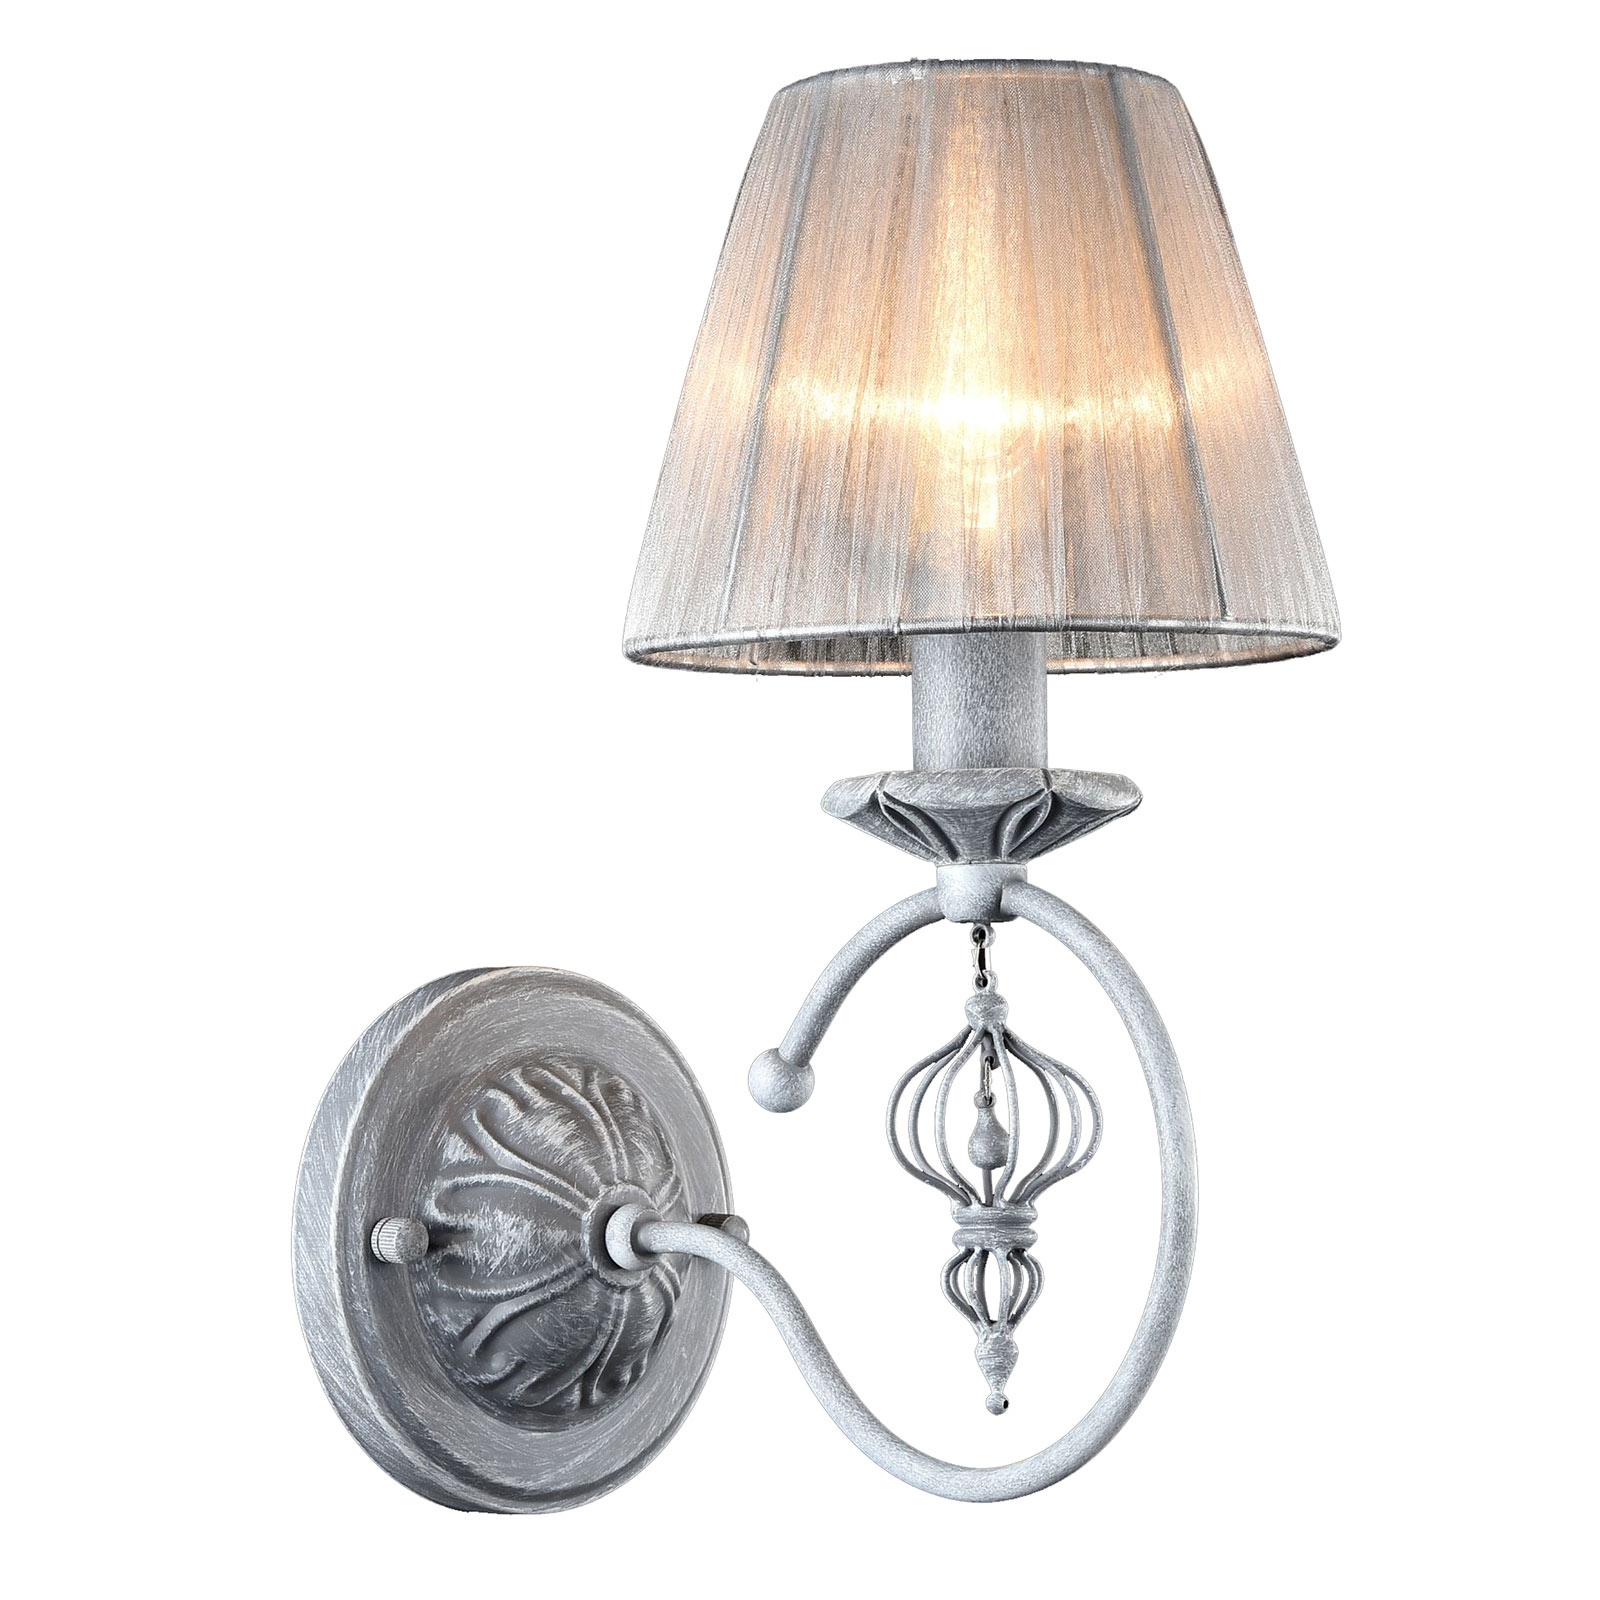 Wandlamp Monsoon met grijze Organza-kap